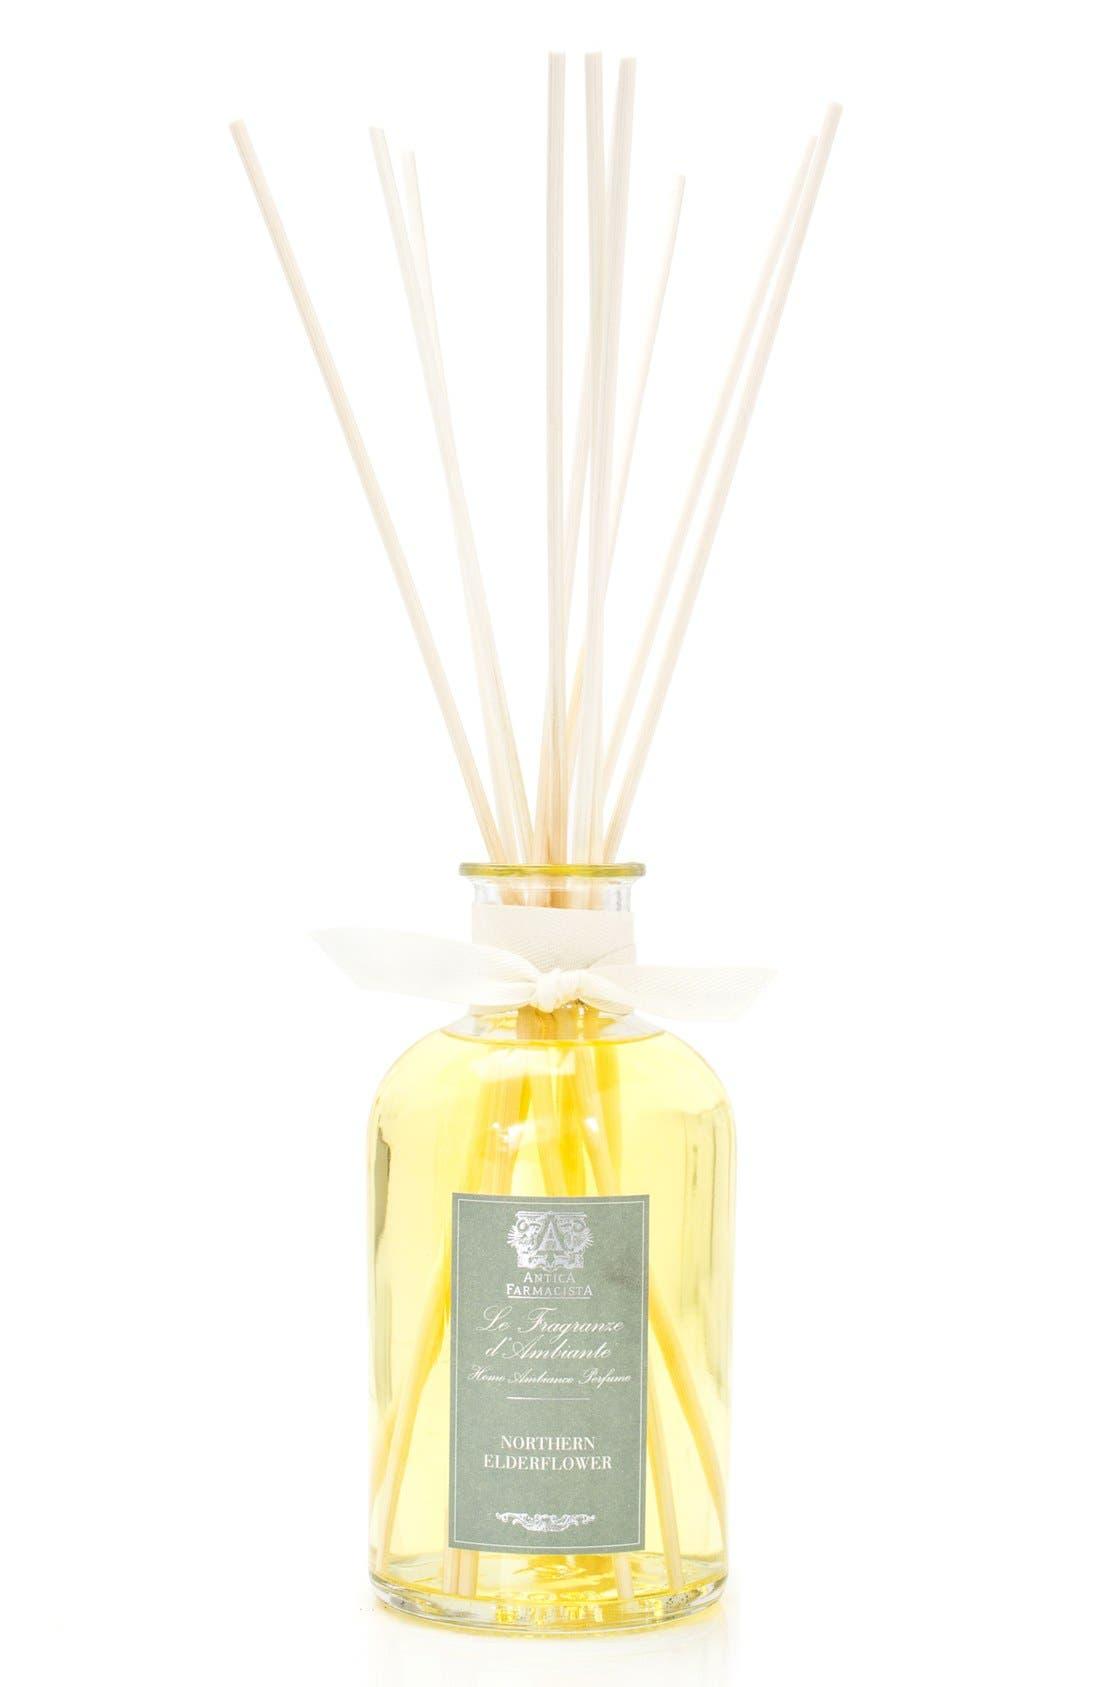 Antica Farmacista Northern Elderflower Home Ambiance Fragrance